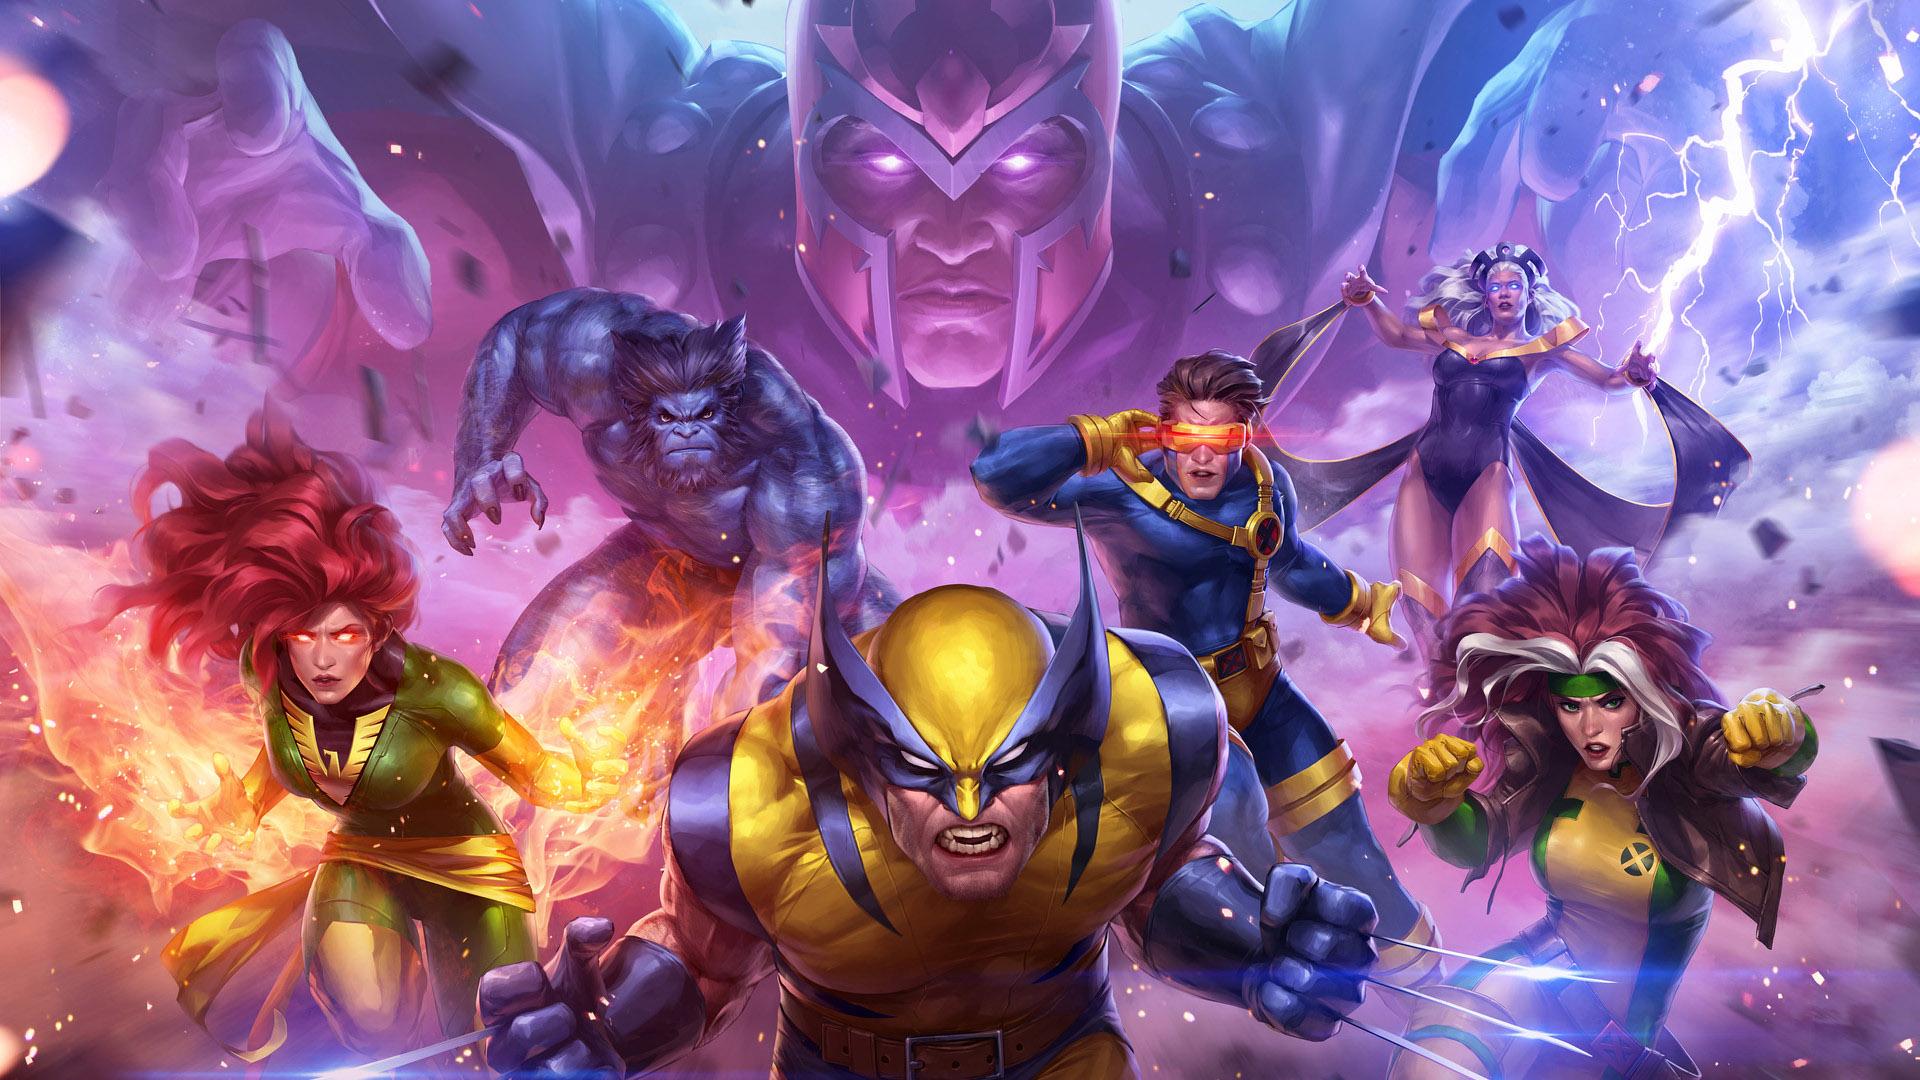 Wolverine Cyclops Beast Henry McCoy Ororo Monroe Magneto Jean Grey Rogue